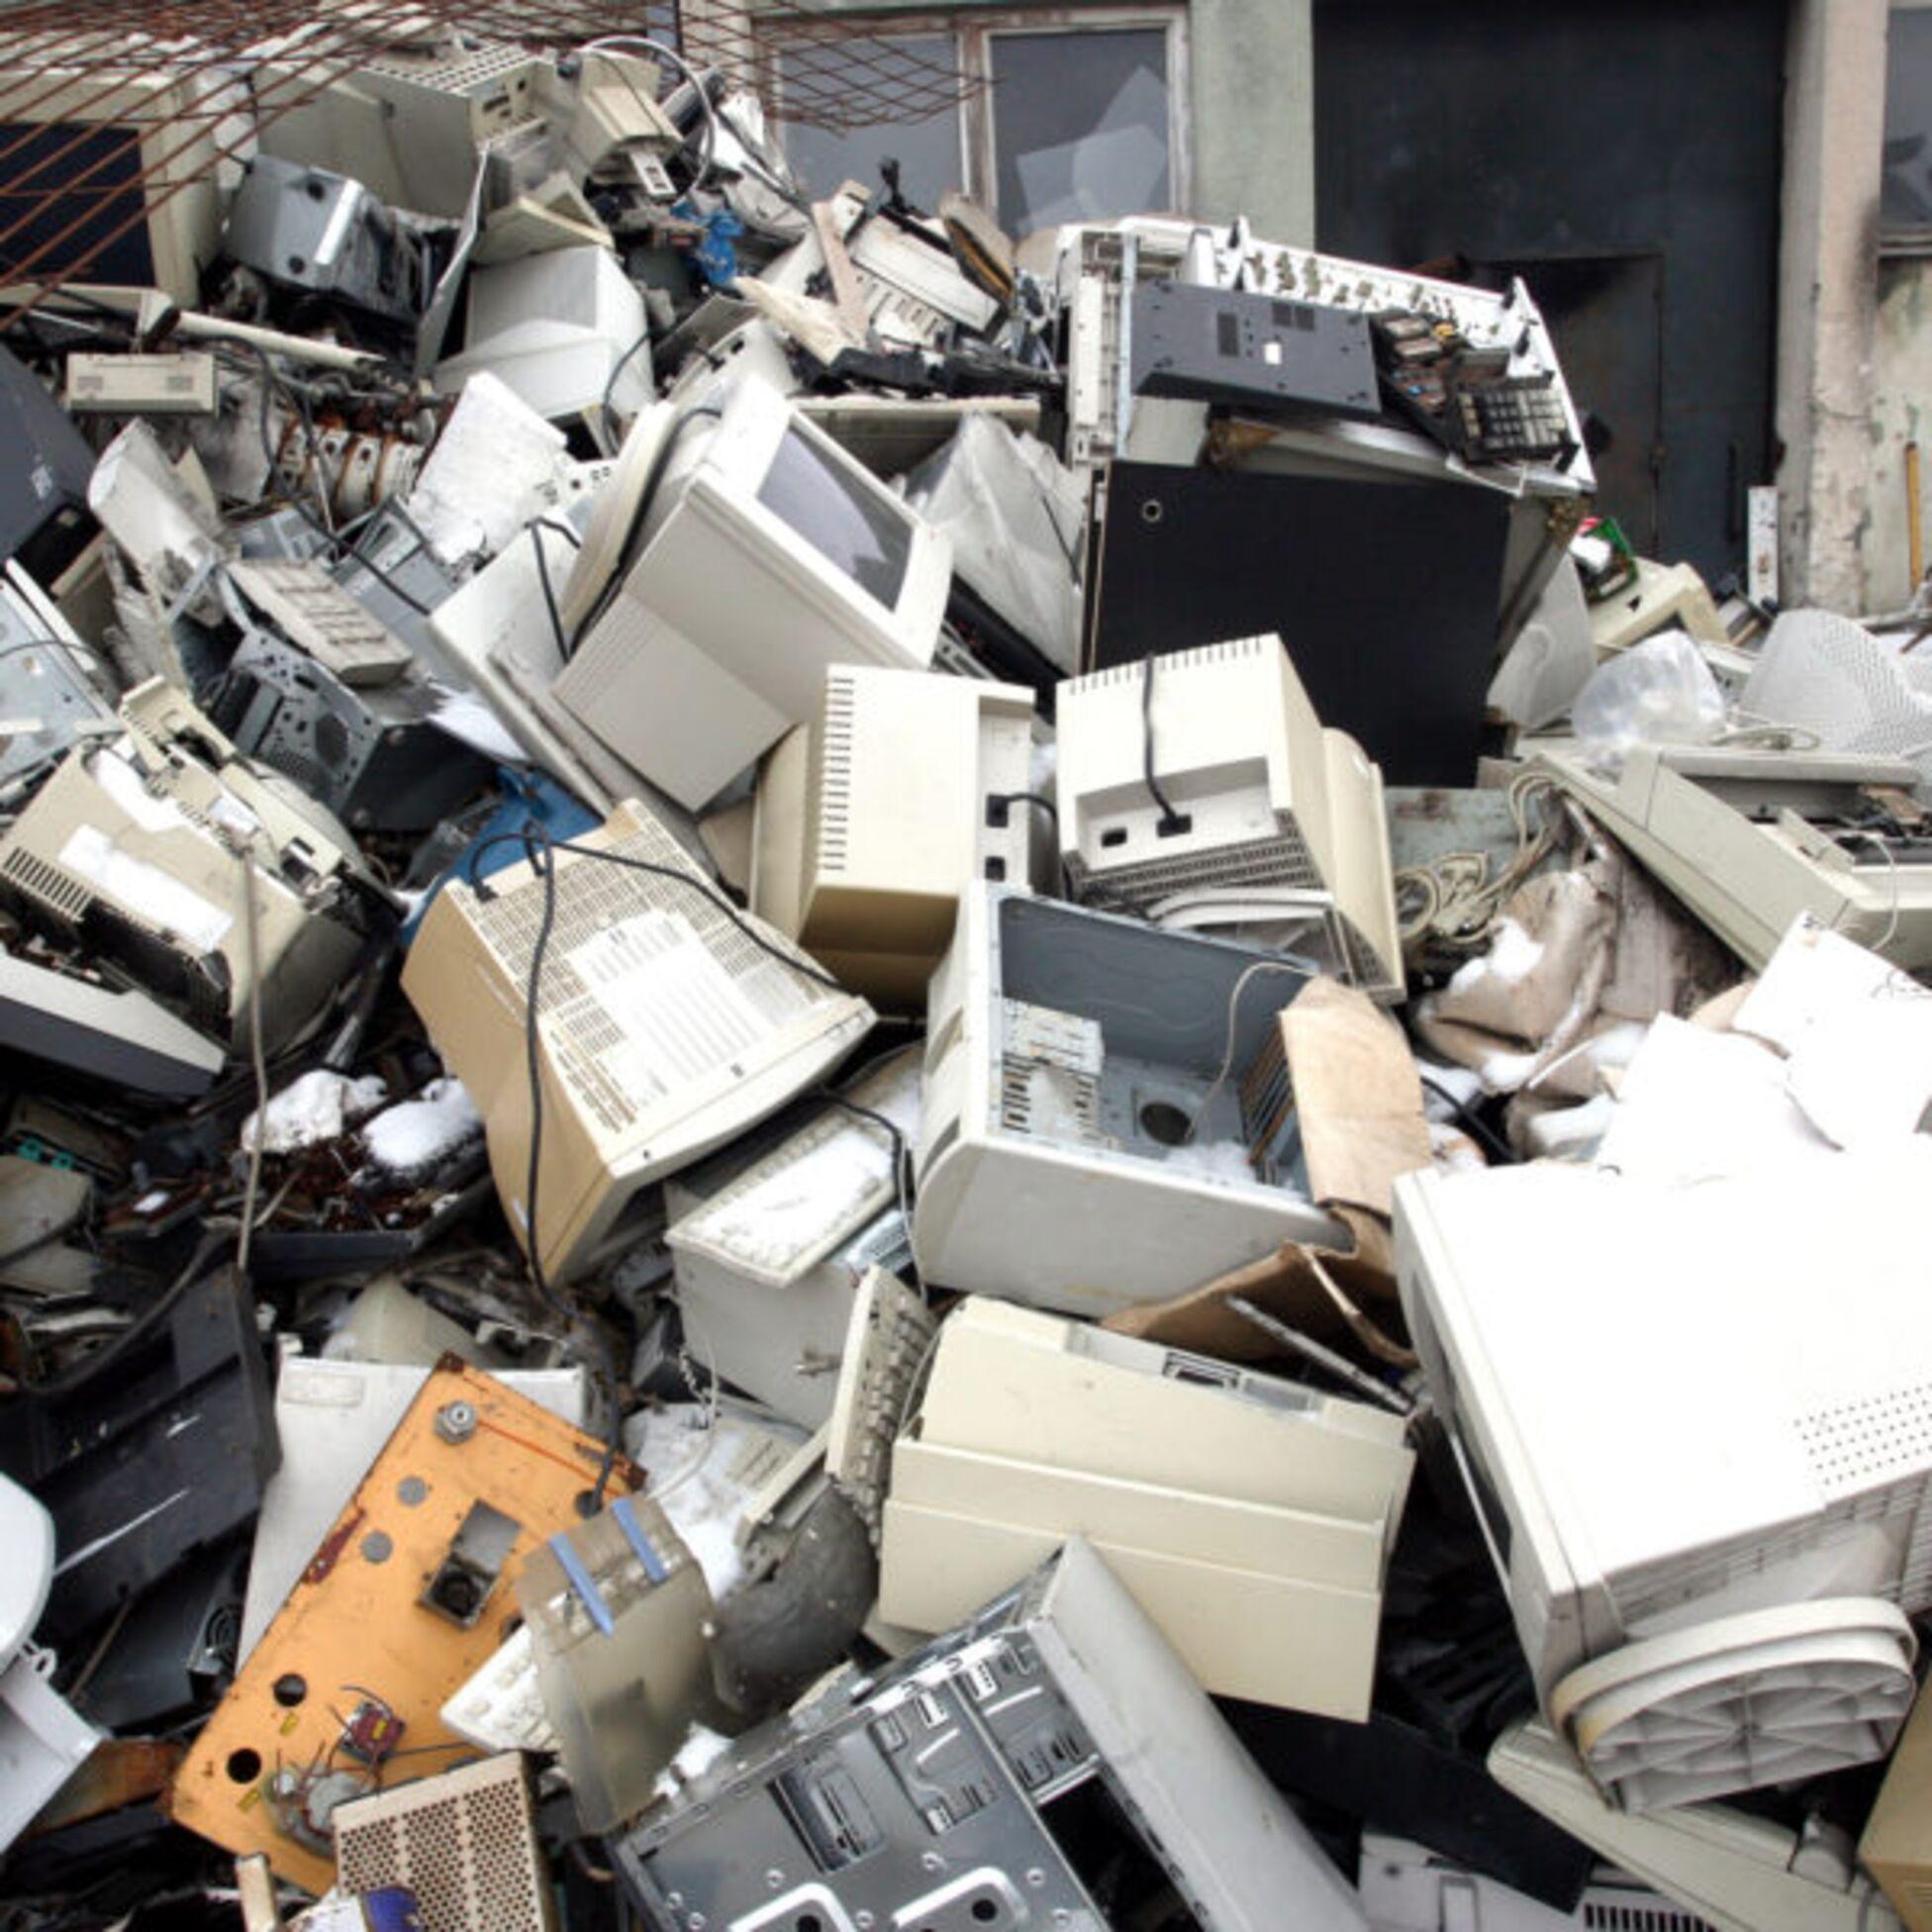 Berg von Elektroschrott auf einem Recyclinghof